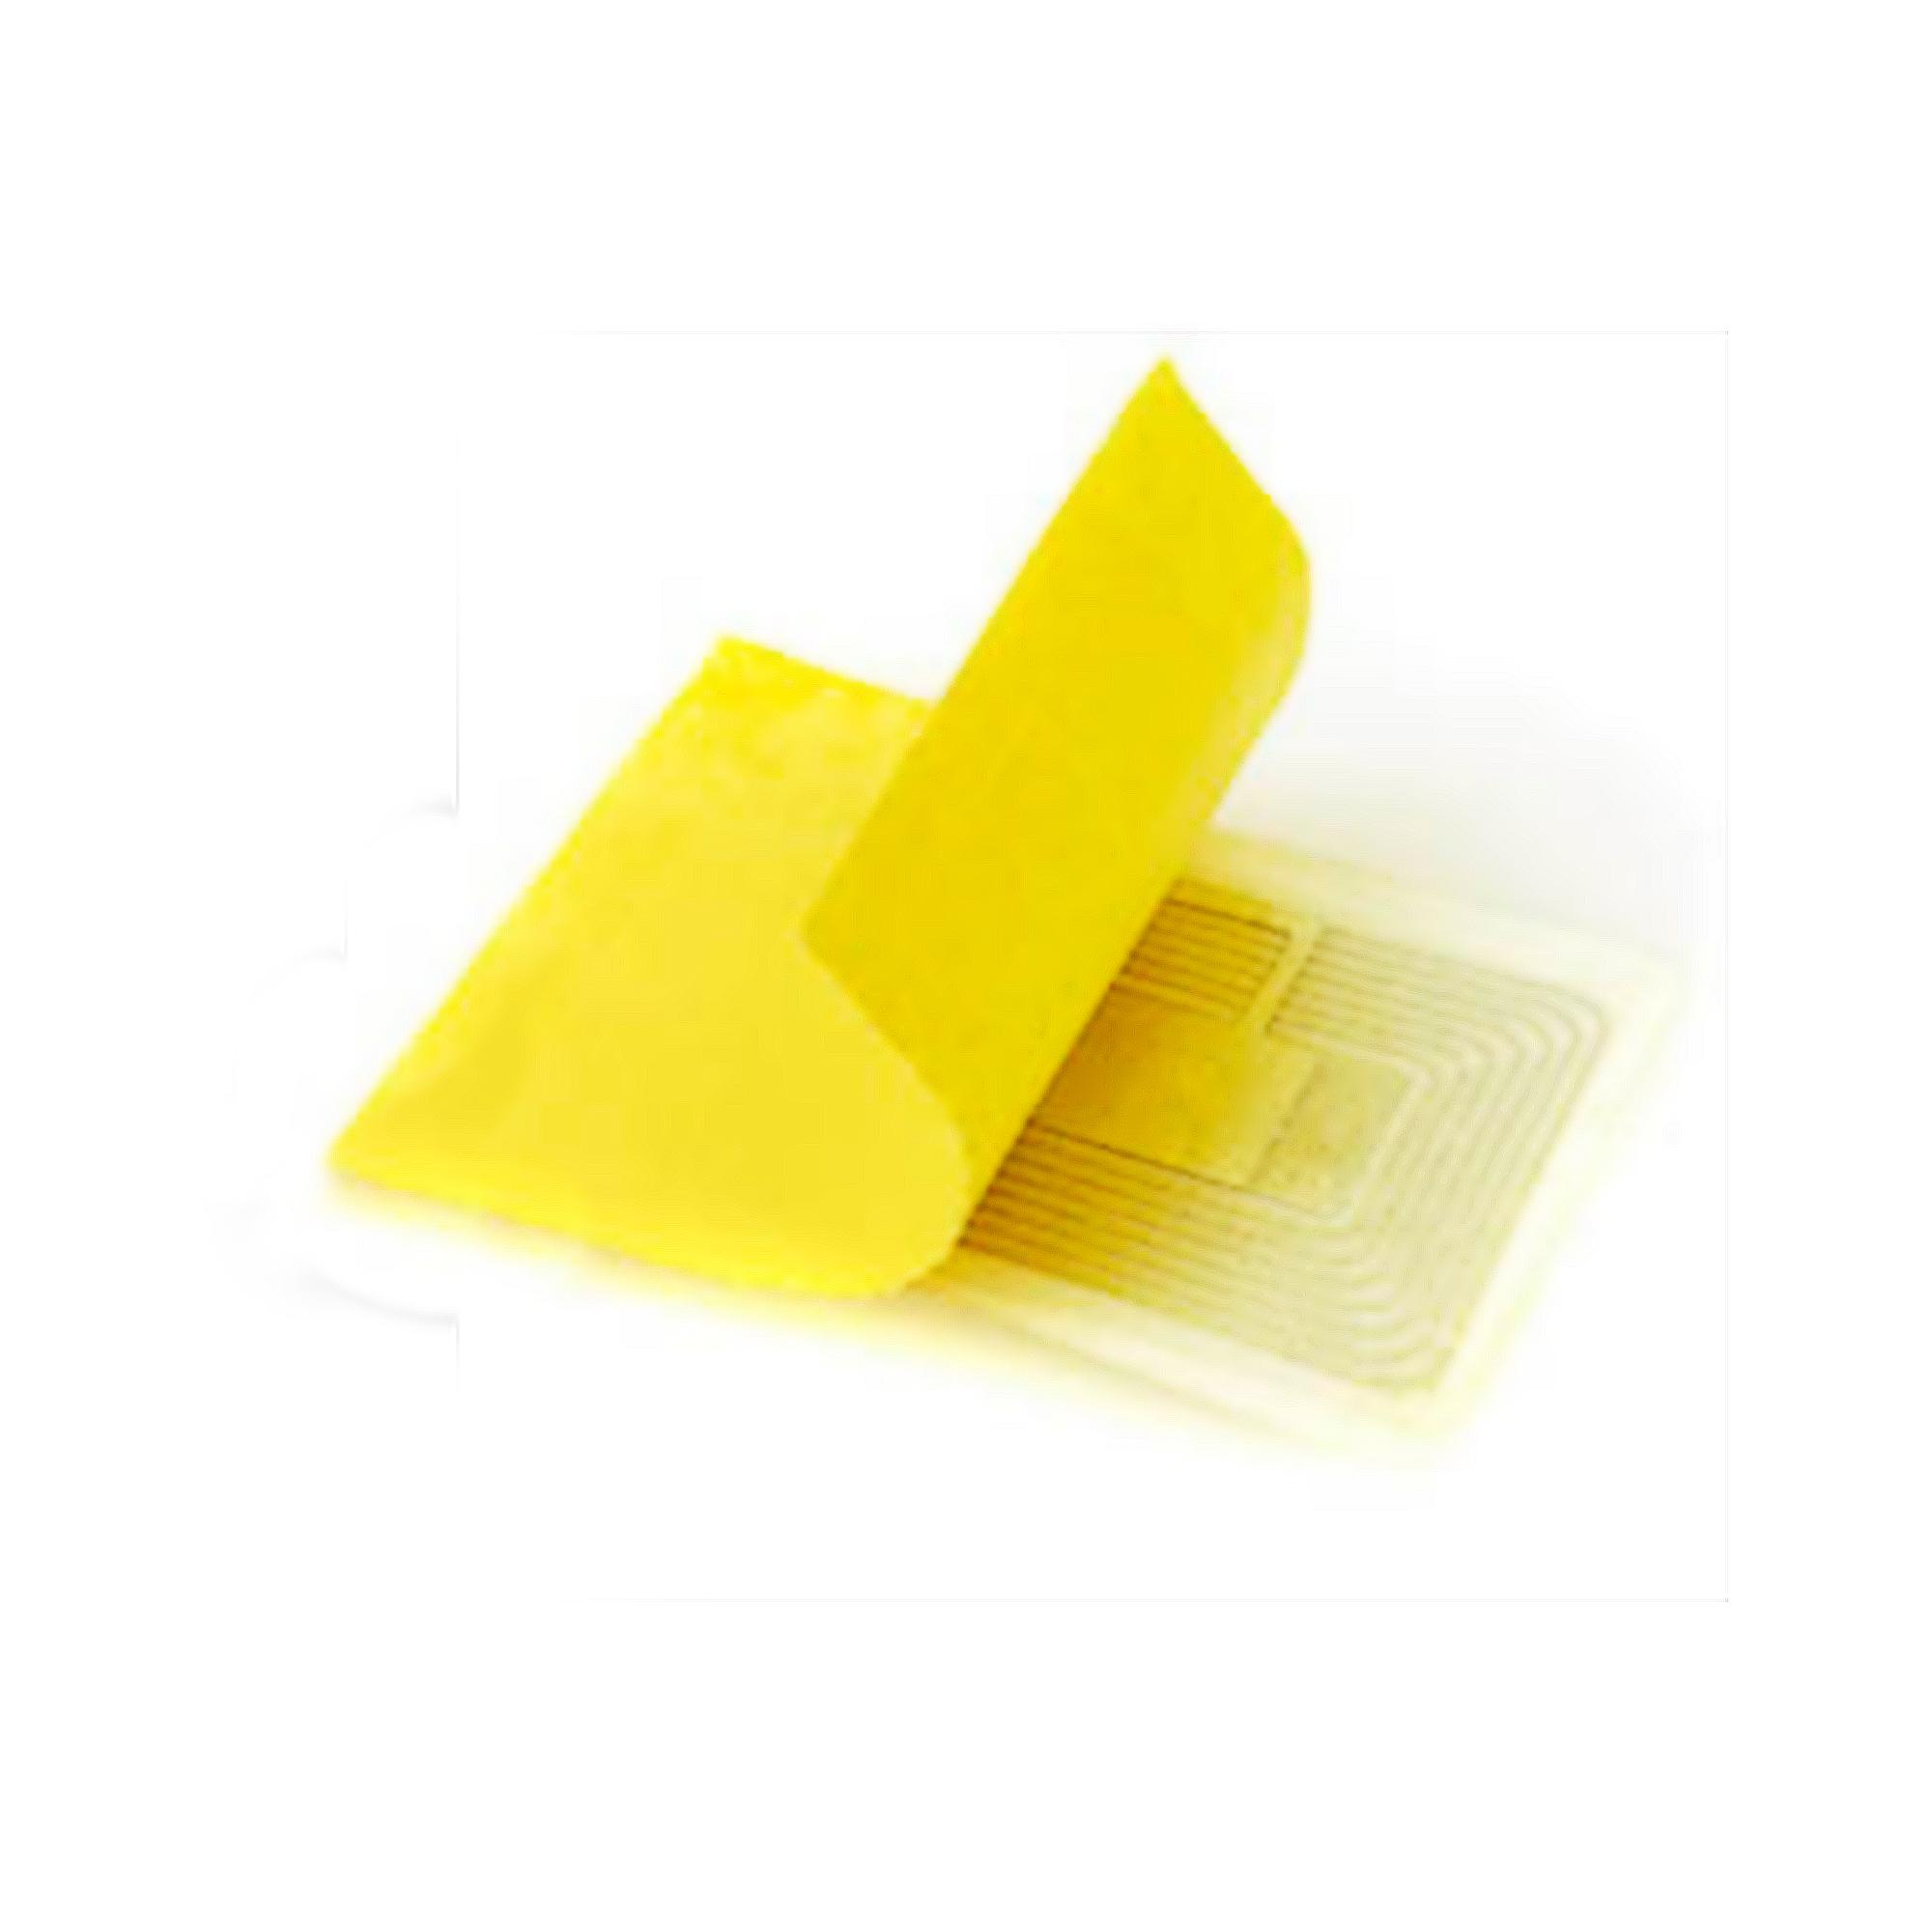 Mifare Ultralight бесконтактная бумажная rfid-метка с чипом EV1 на самоклейке